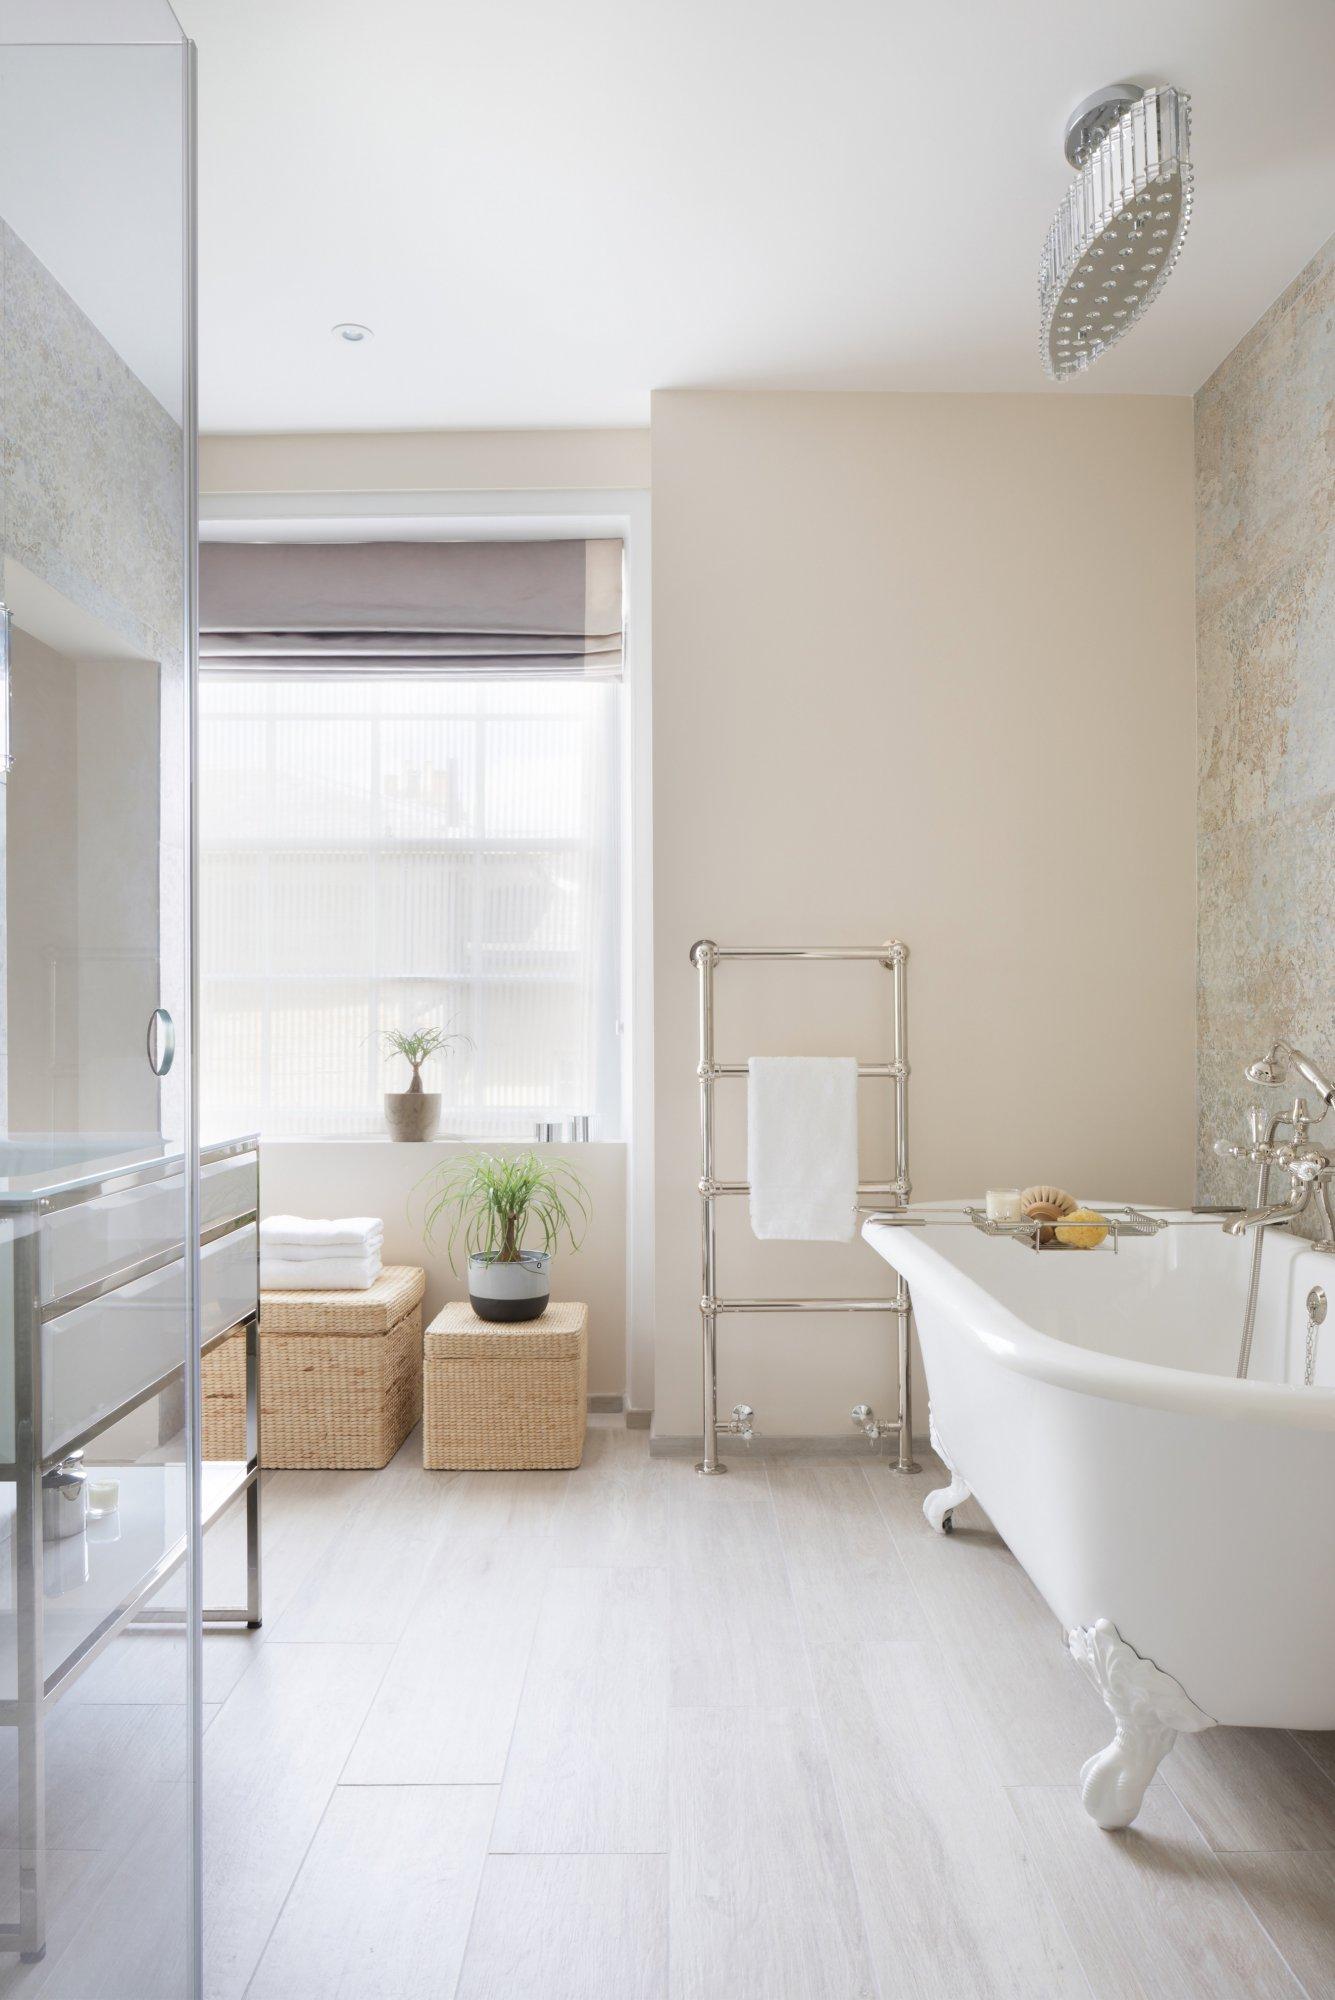 West One Bathrooms TunWells 5